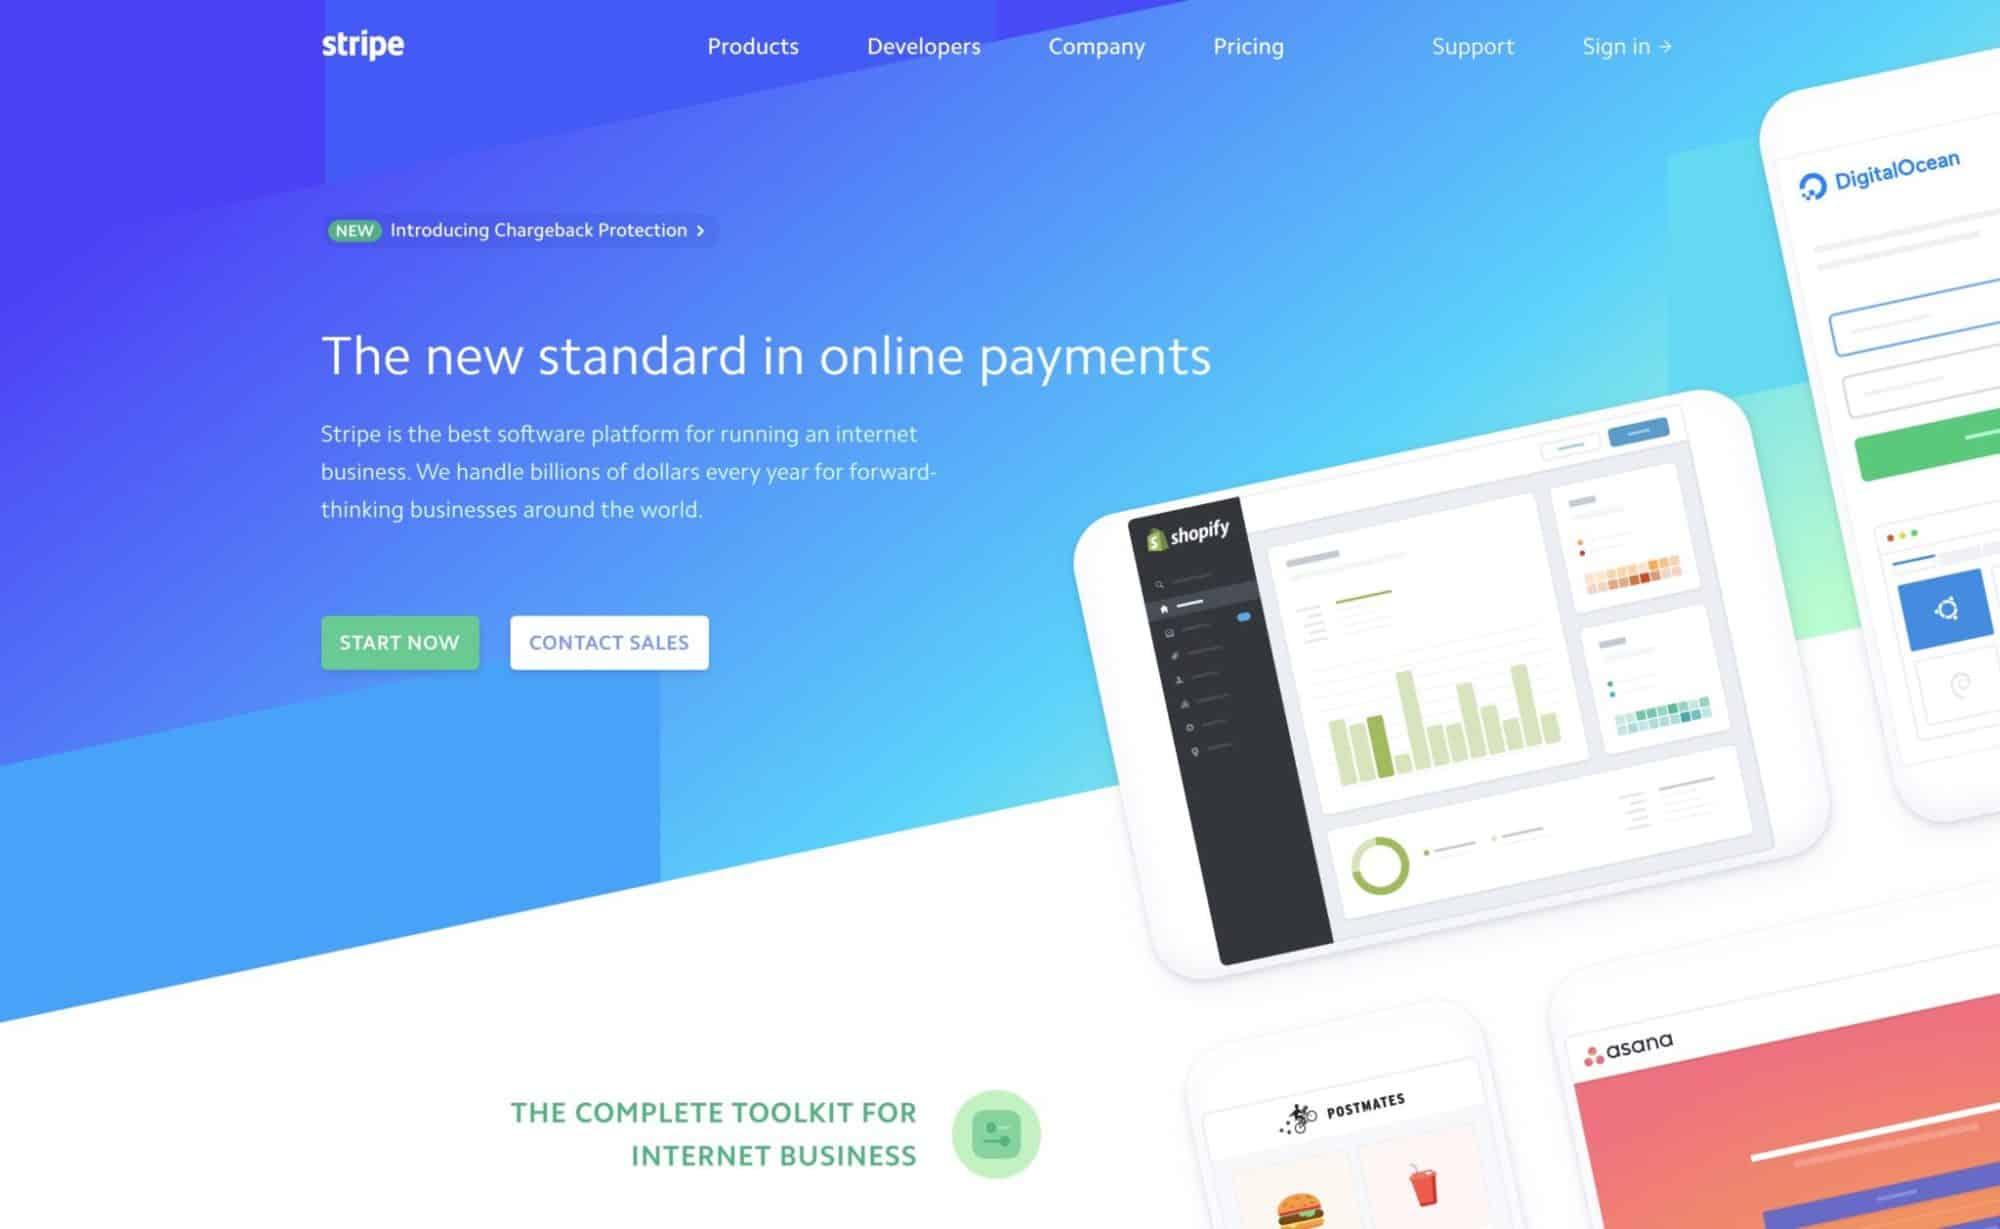 Trello - Website inspiration, Design, Markeiting